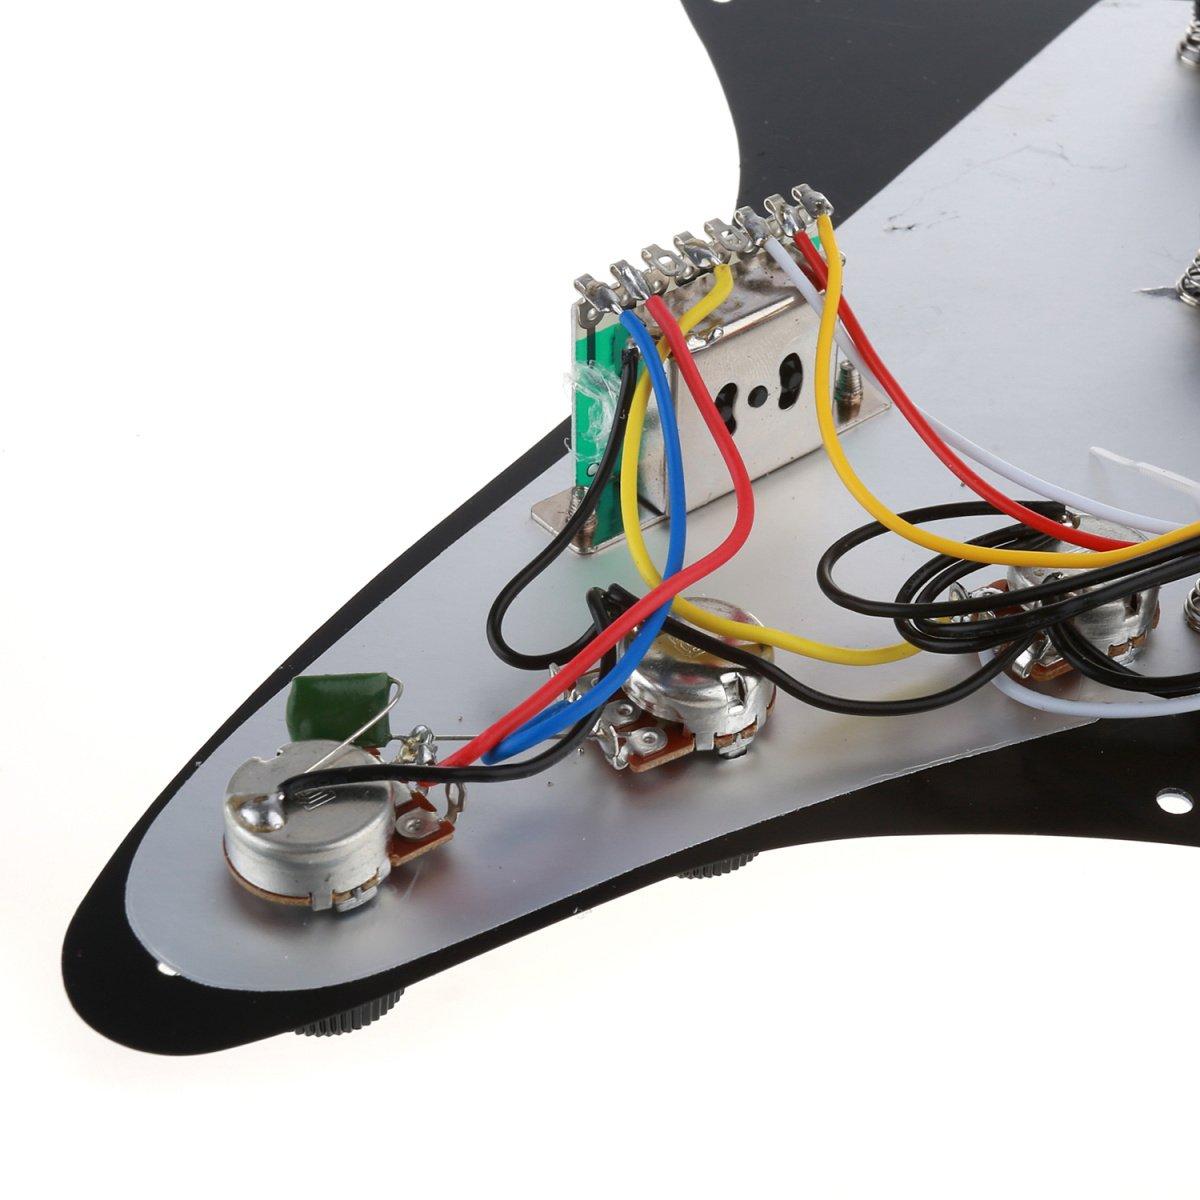 3 Ply 11 Holes SSS Pickguard Scratch Prewired Guard Plate Loaded Pickup